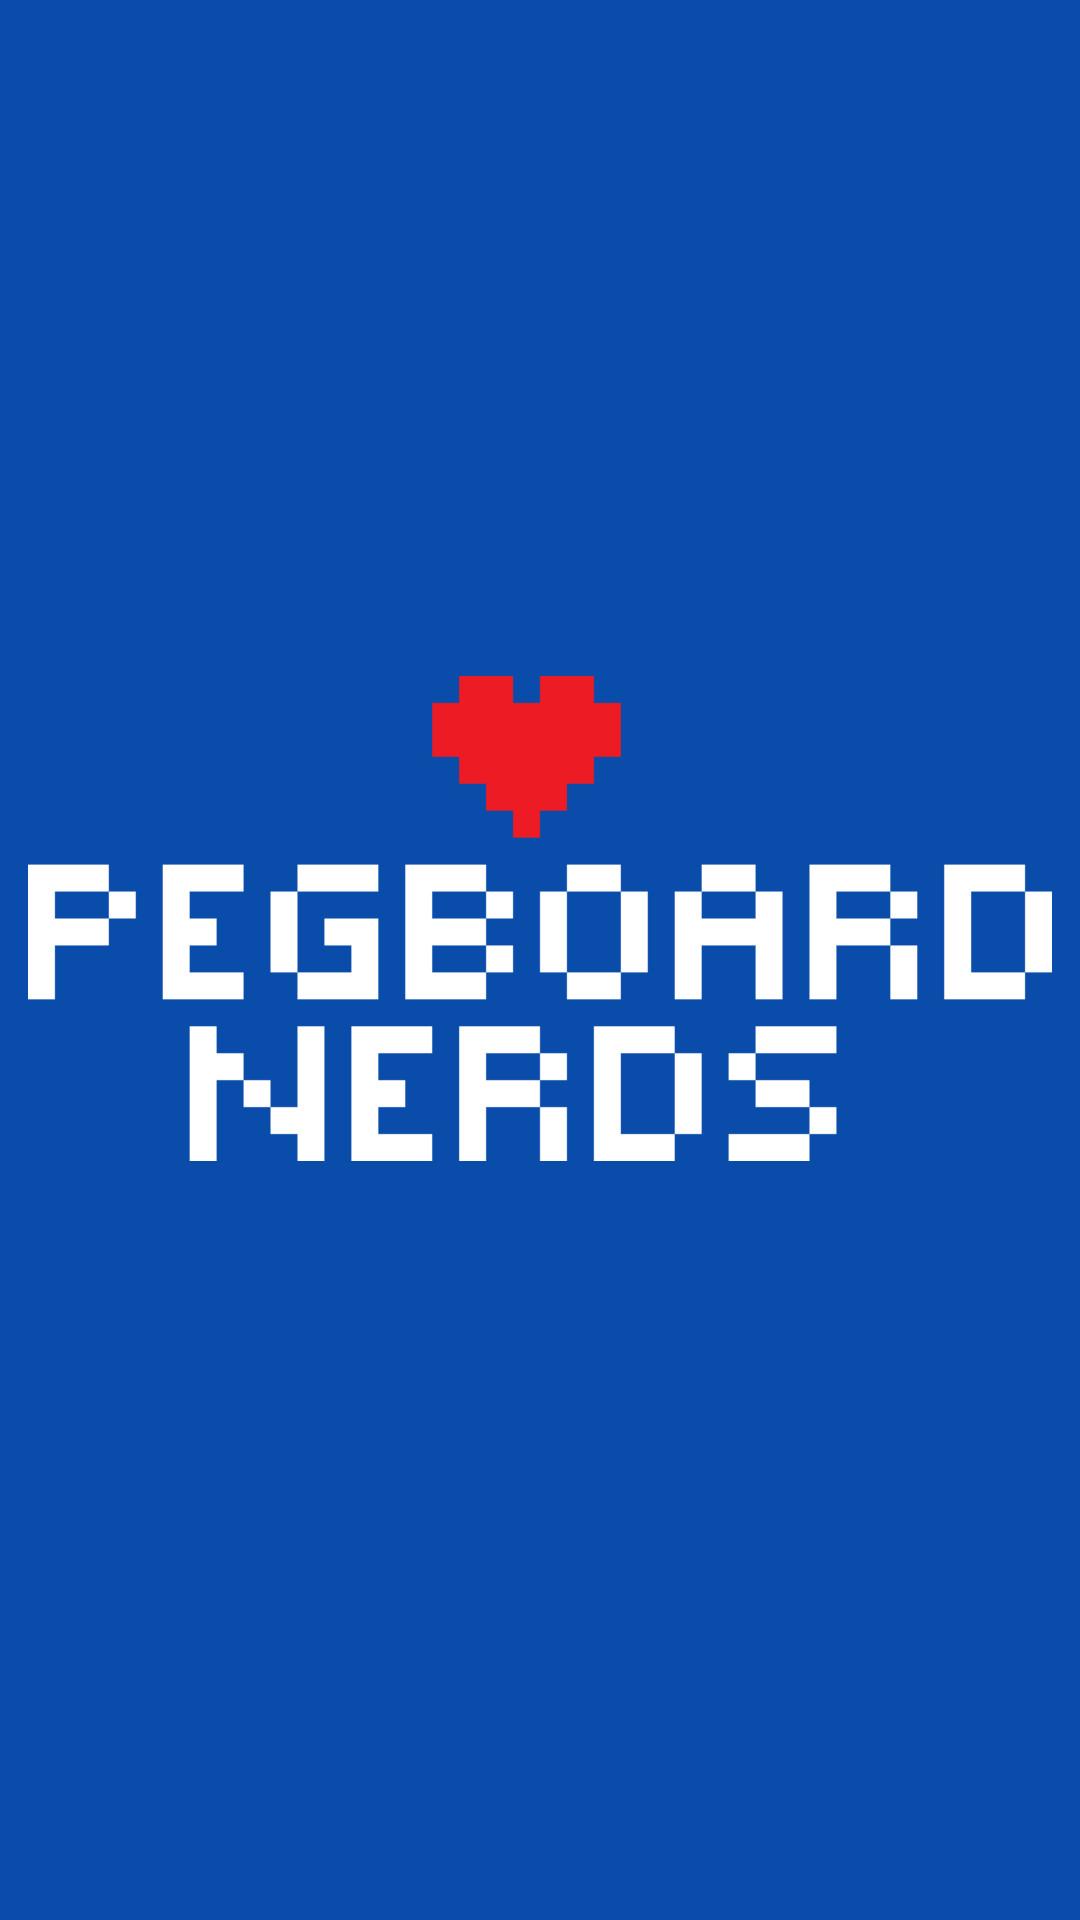 Pegboard Nerds Phone Wallpaper